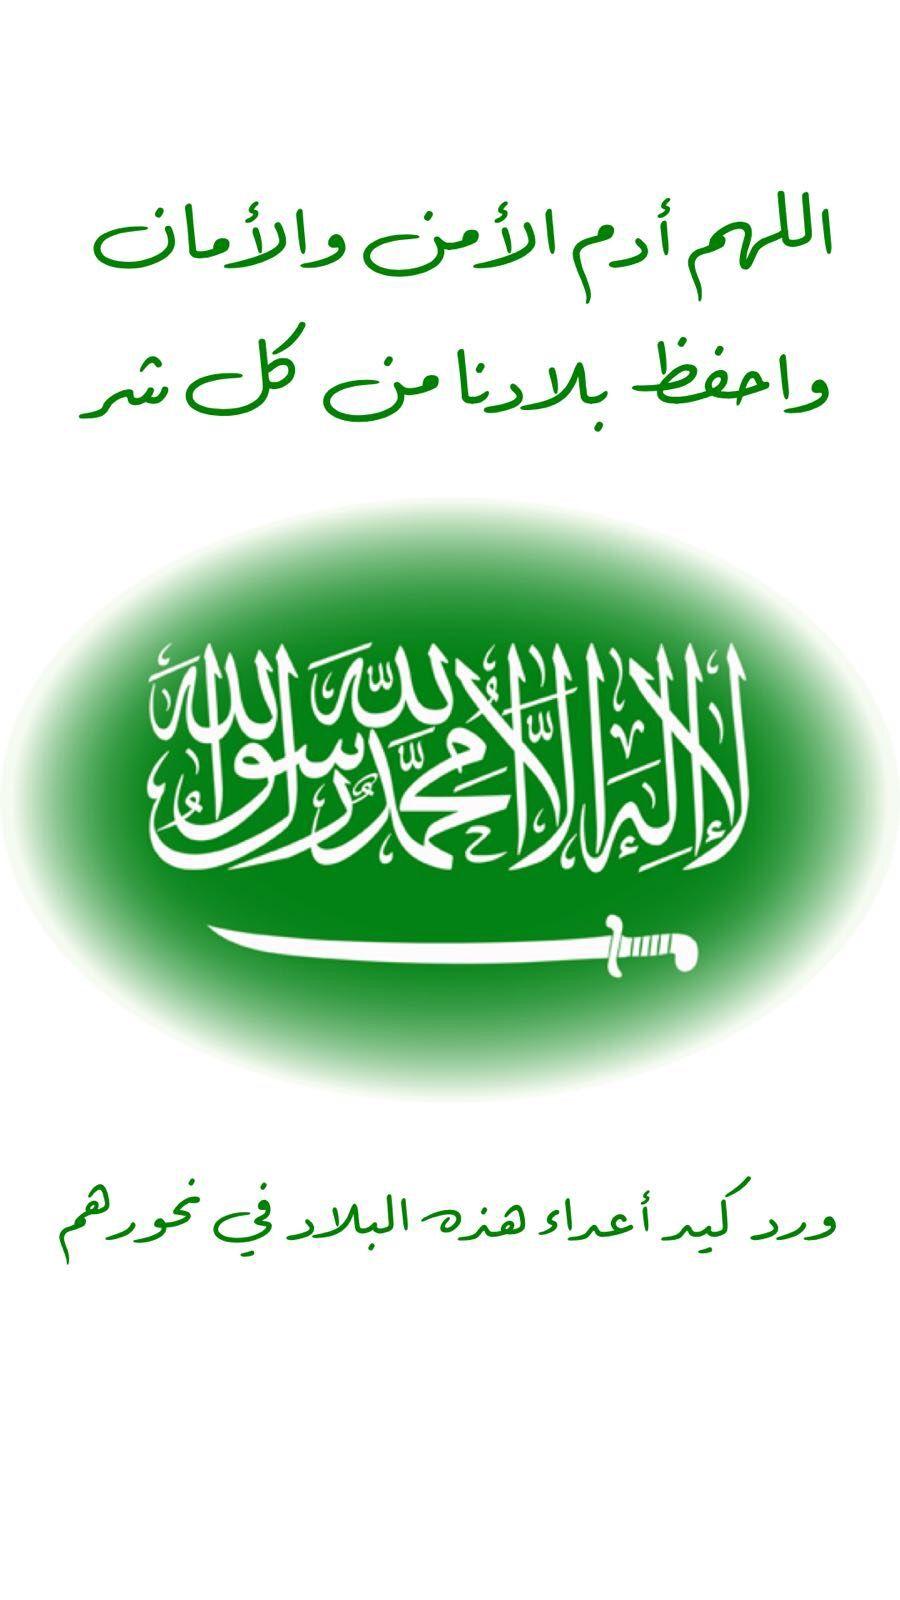 تلاحمنا اساس وحدتنا الوطن خط أحمر السعودية National Day Saudi King Salman Saudi Arabia Saudi Arabia